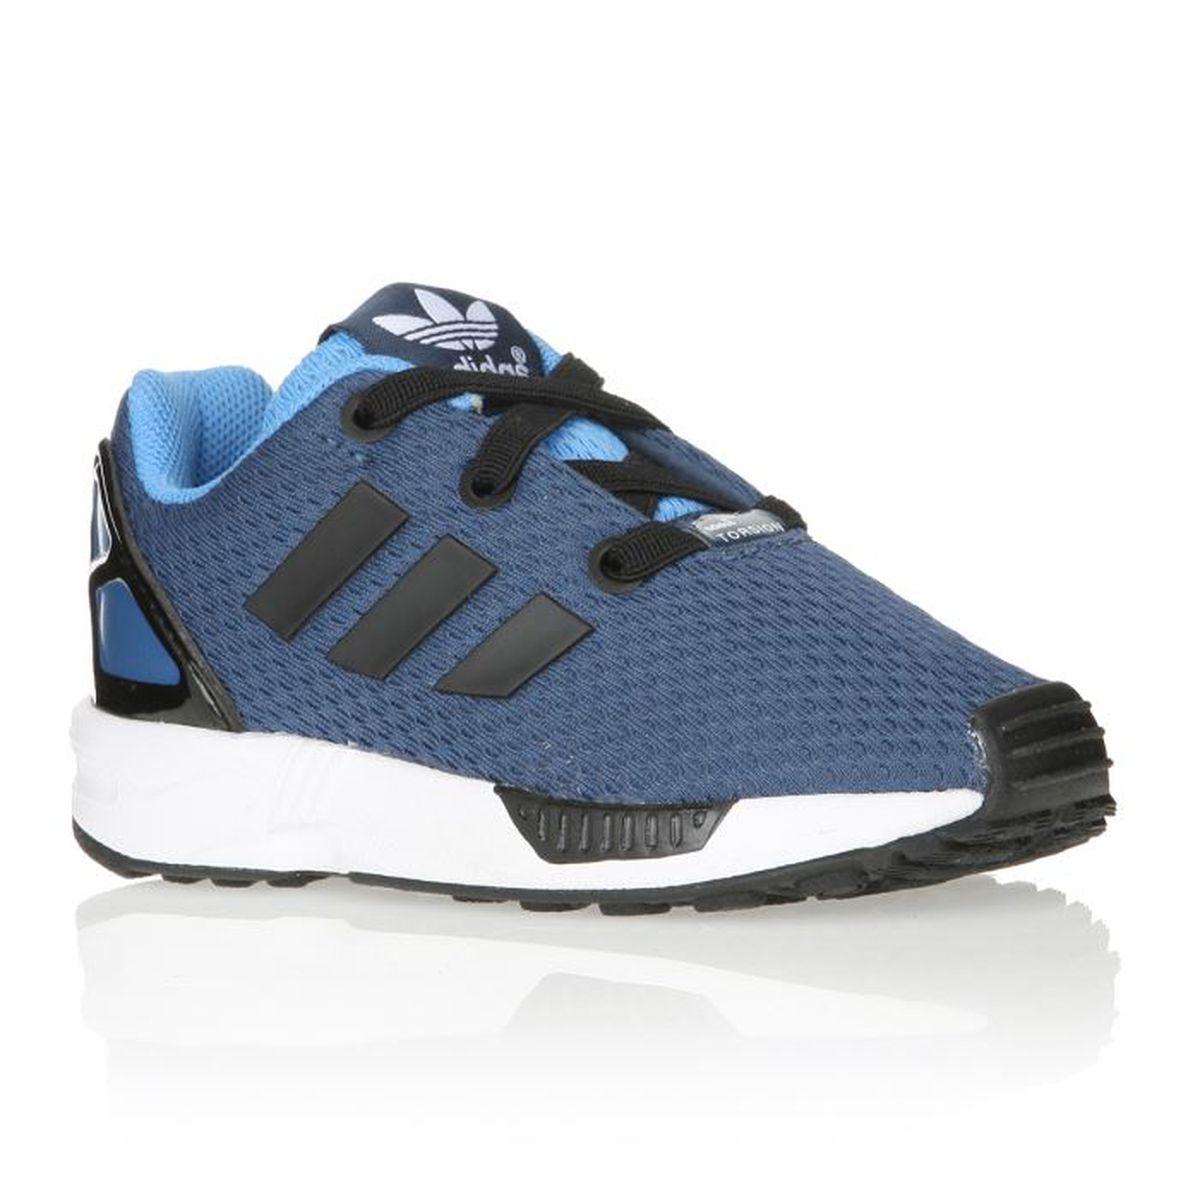 Bébé Chaussures   Adidas Originals Baskets Zx Flux El